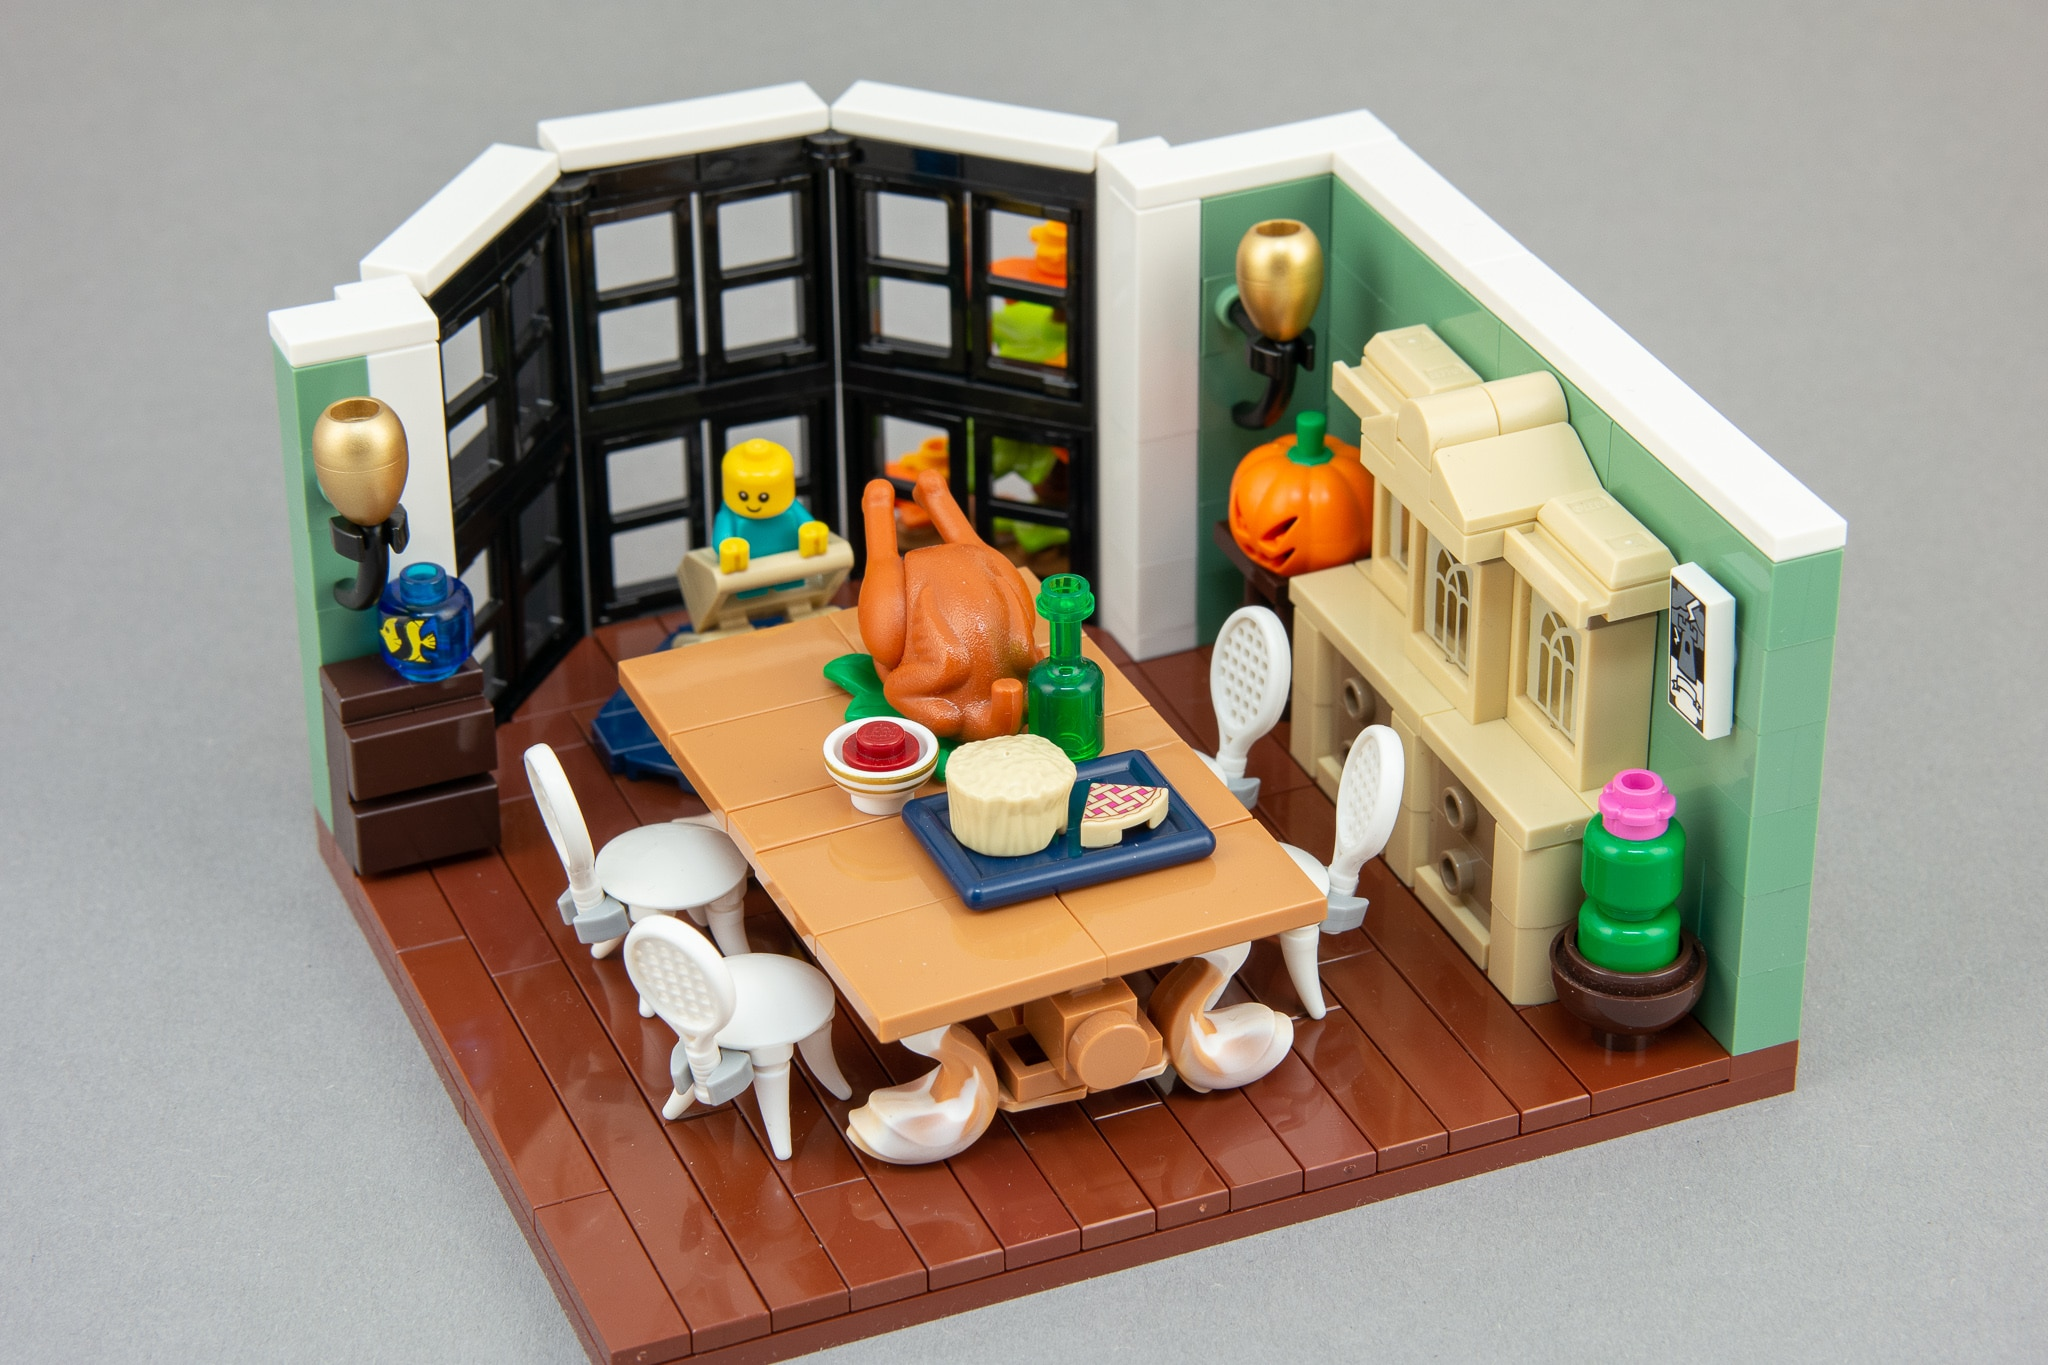 LEGO Moc Bausinpiration Esszimmer (5)